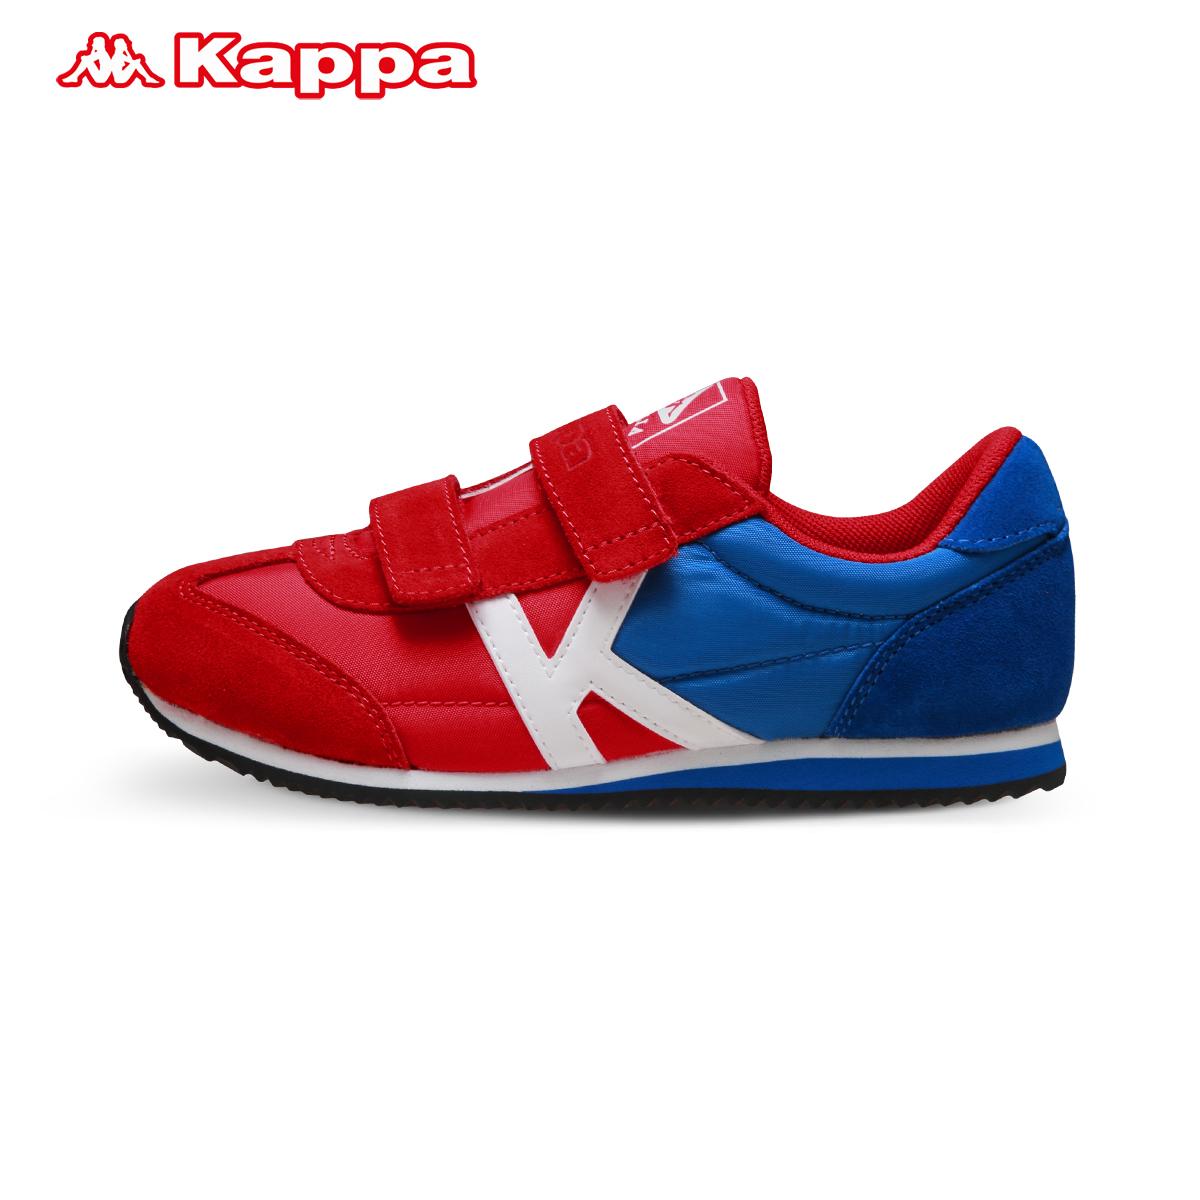 Kappakids童鞋  男女兒童魔術貼 鞋複古跑鞋潮鞋K05Y5MM21